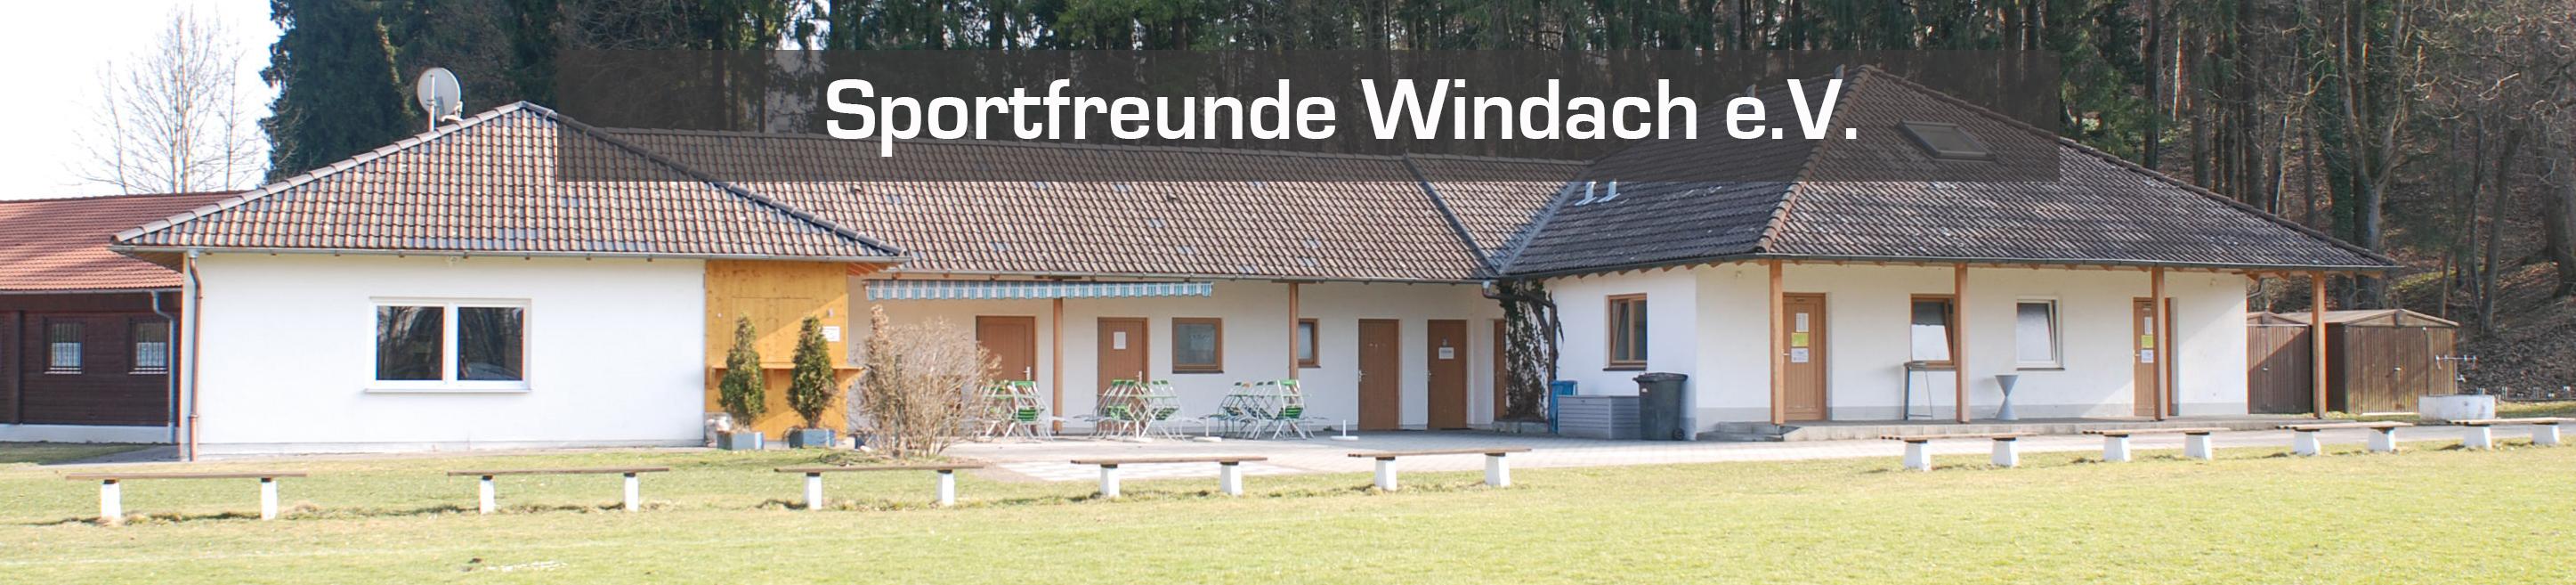 sportfreunde-Windach.de